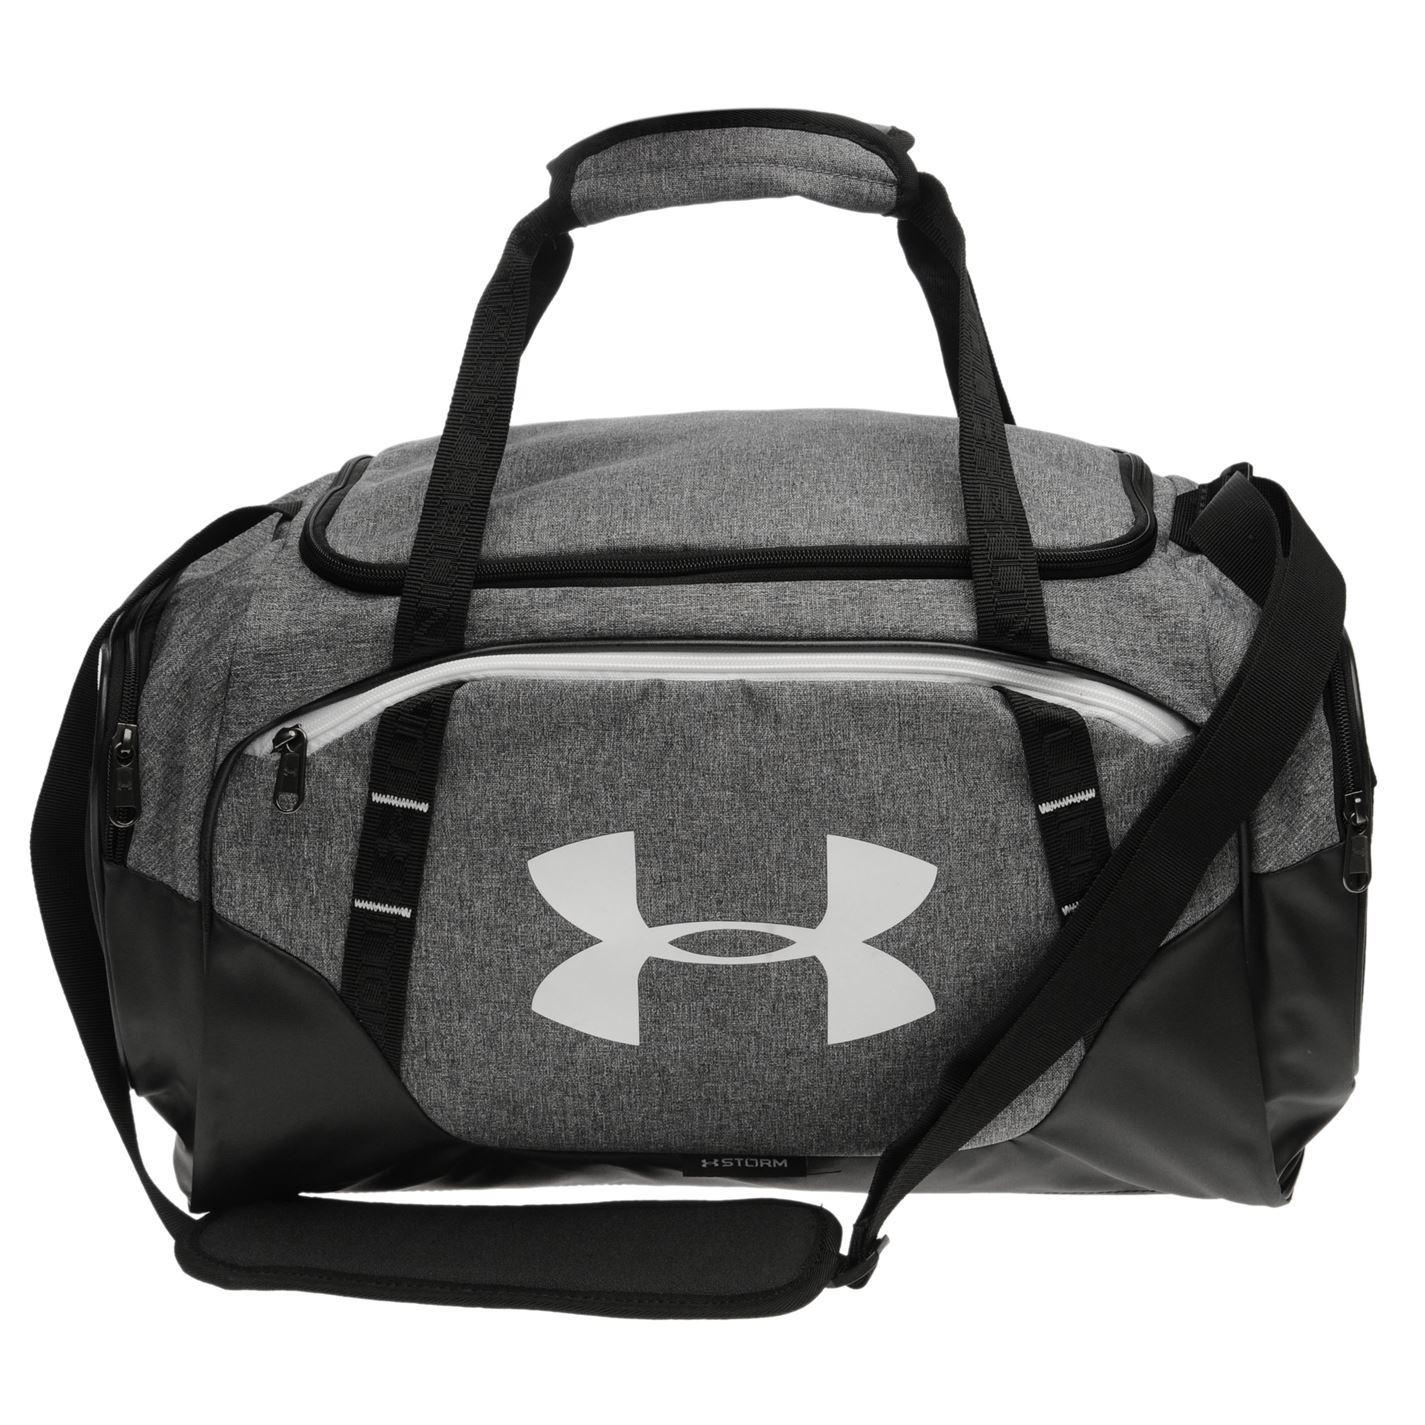 Under Armour Undeniable 3 Duffle Bag Grey Kitbag Gymbag Holdall Carryall df1c2c30a9ab7